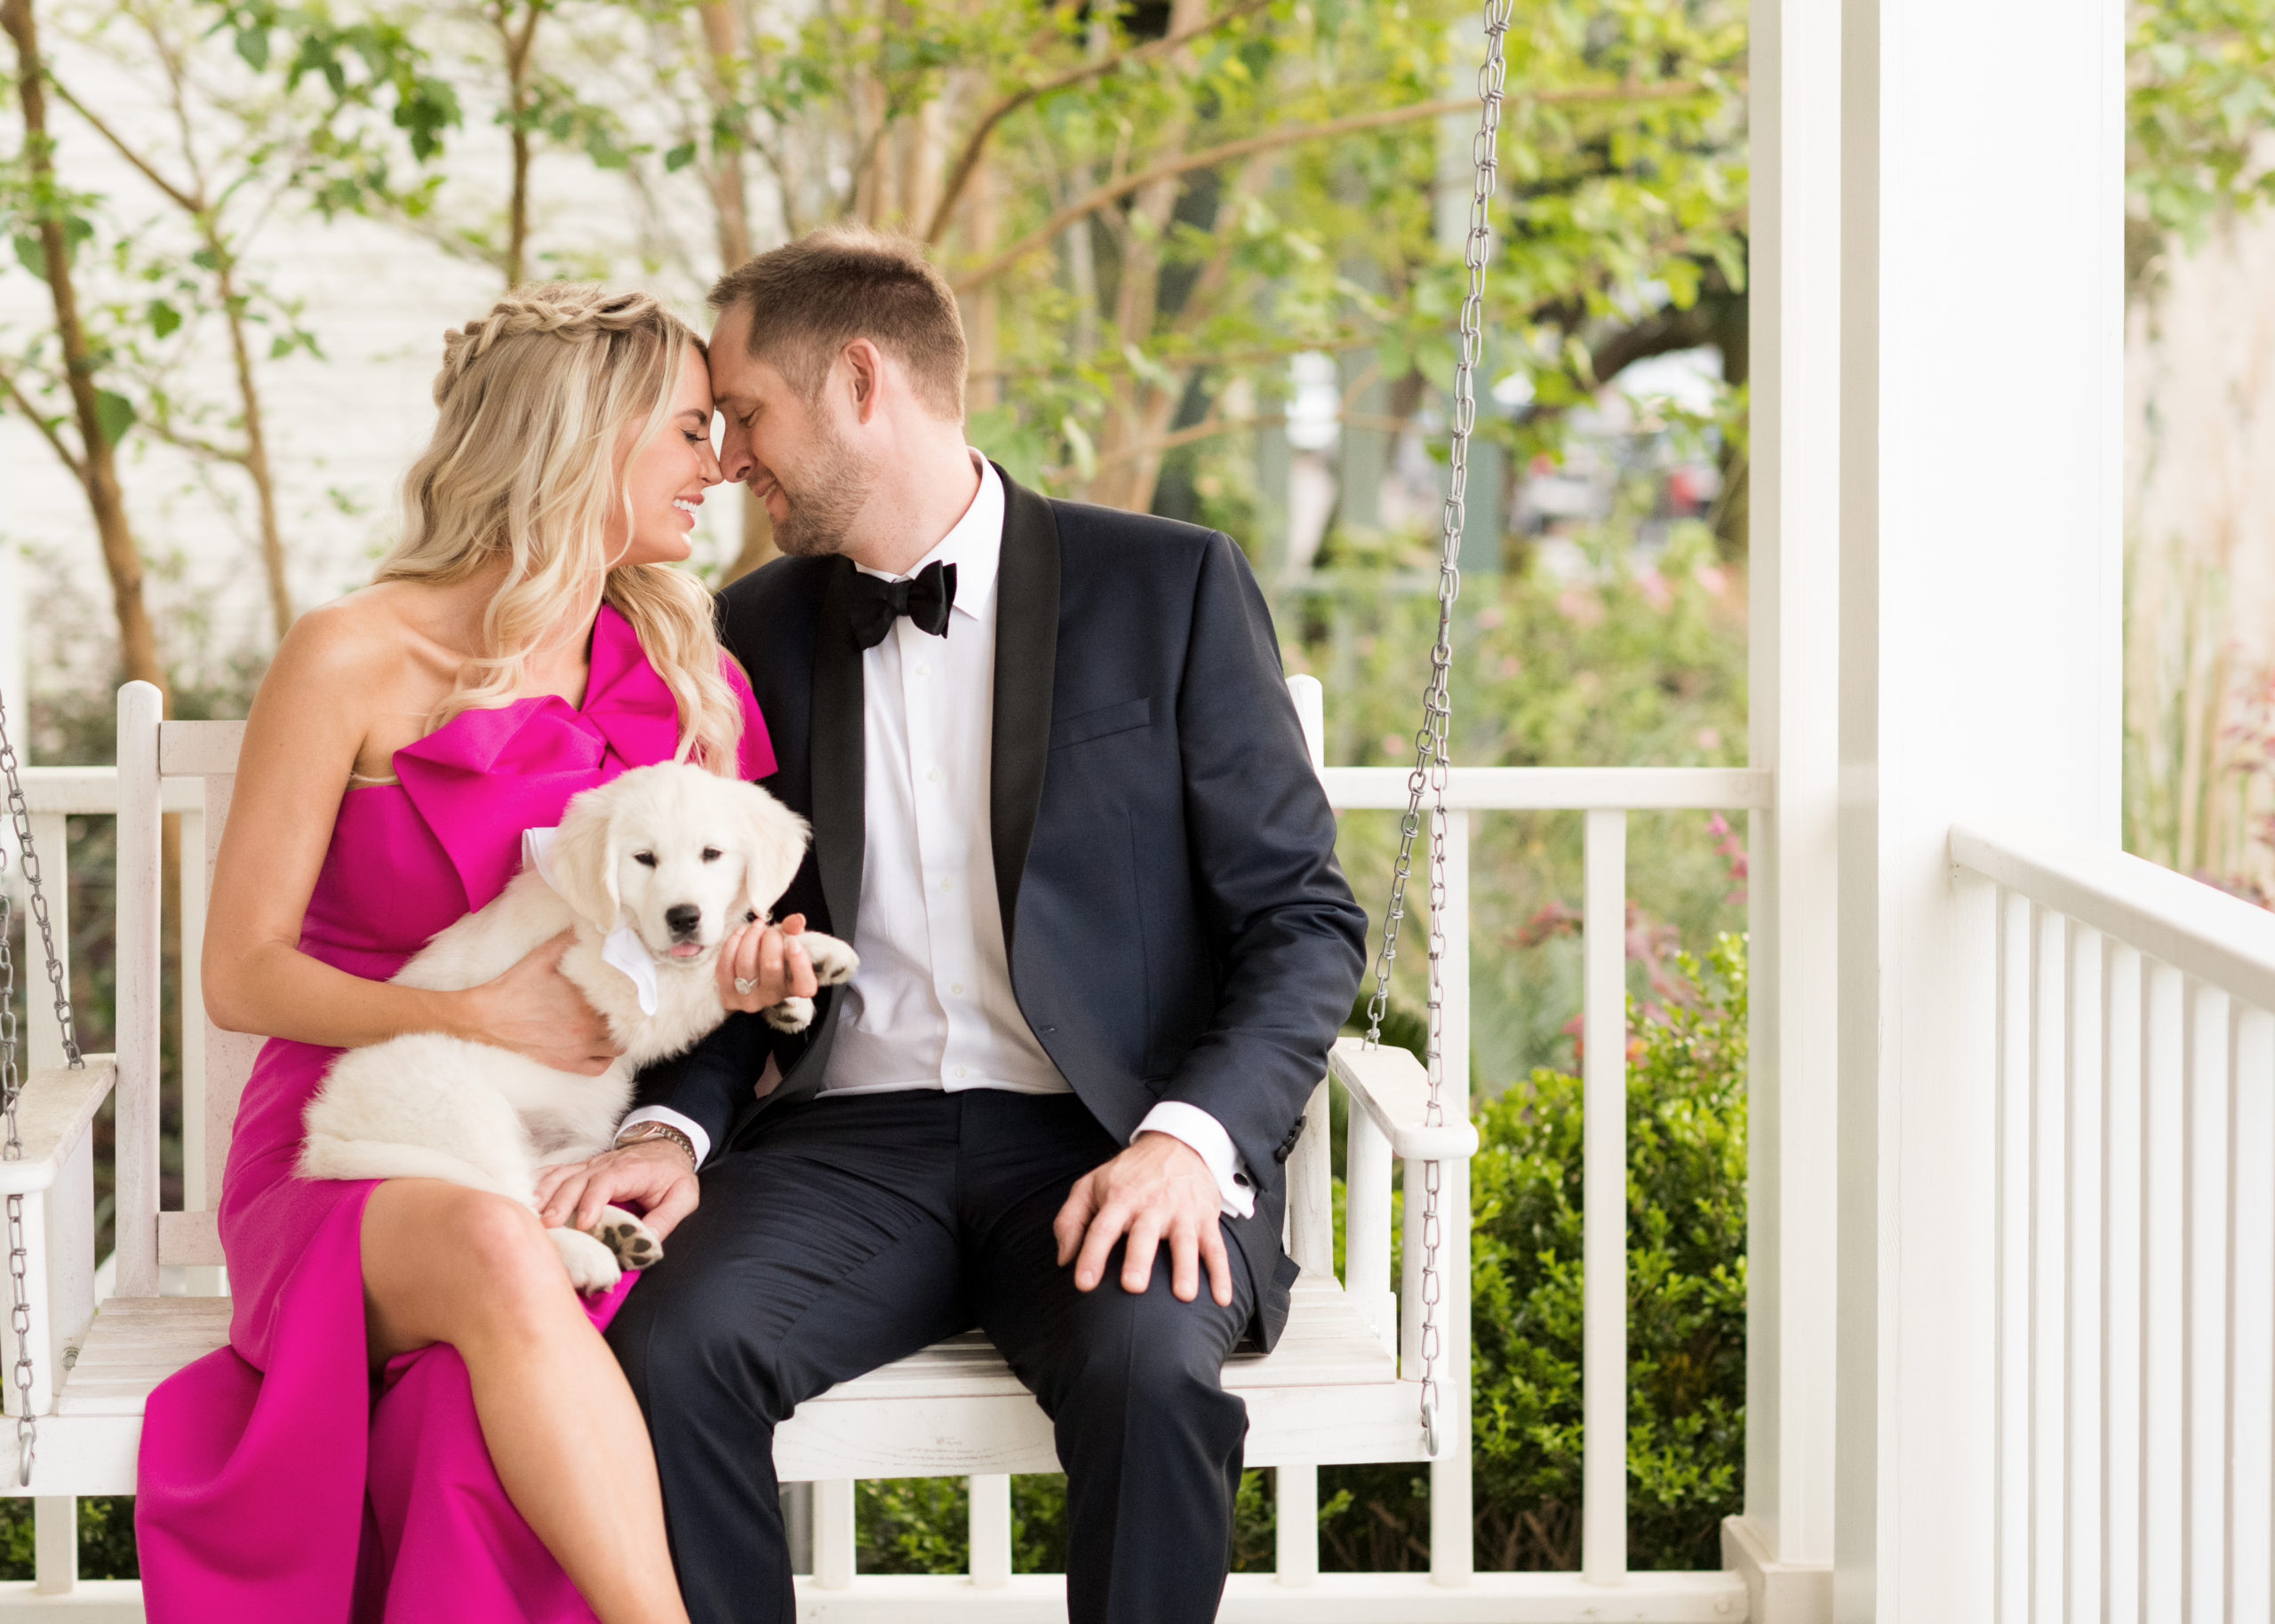 Wedding photo - Aislinn Kate Wedding Photography - Pensacola, Florida